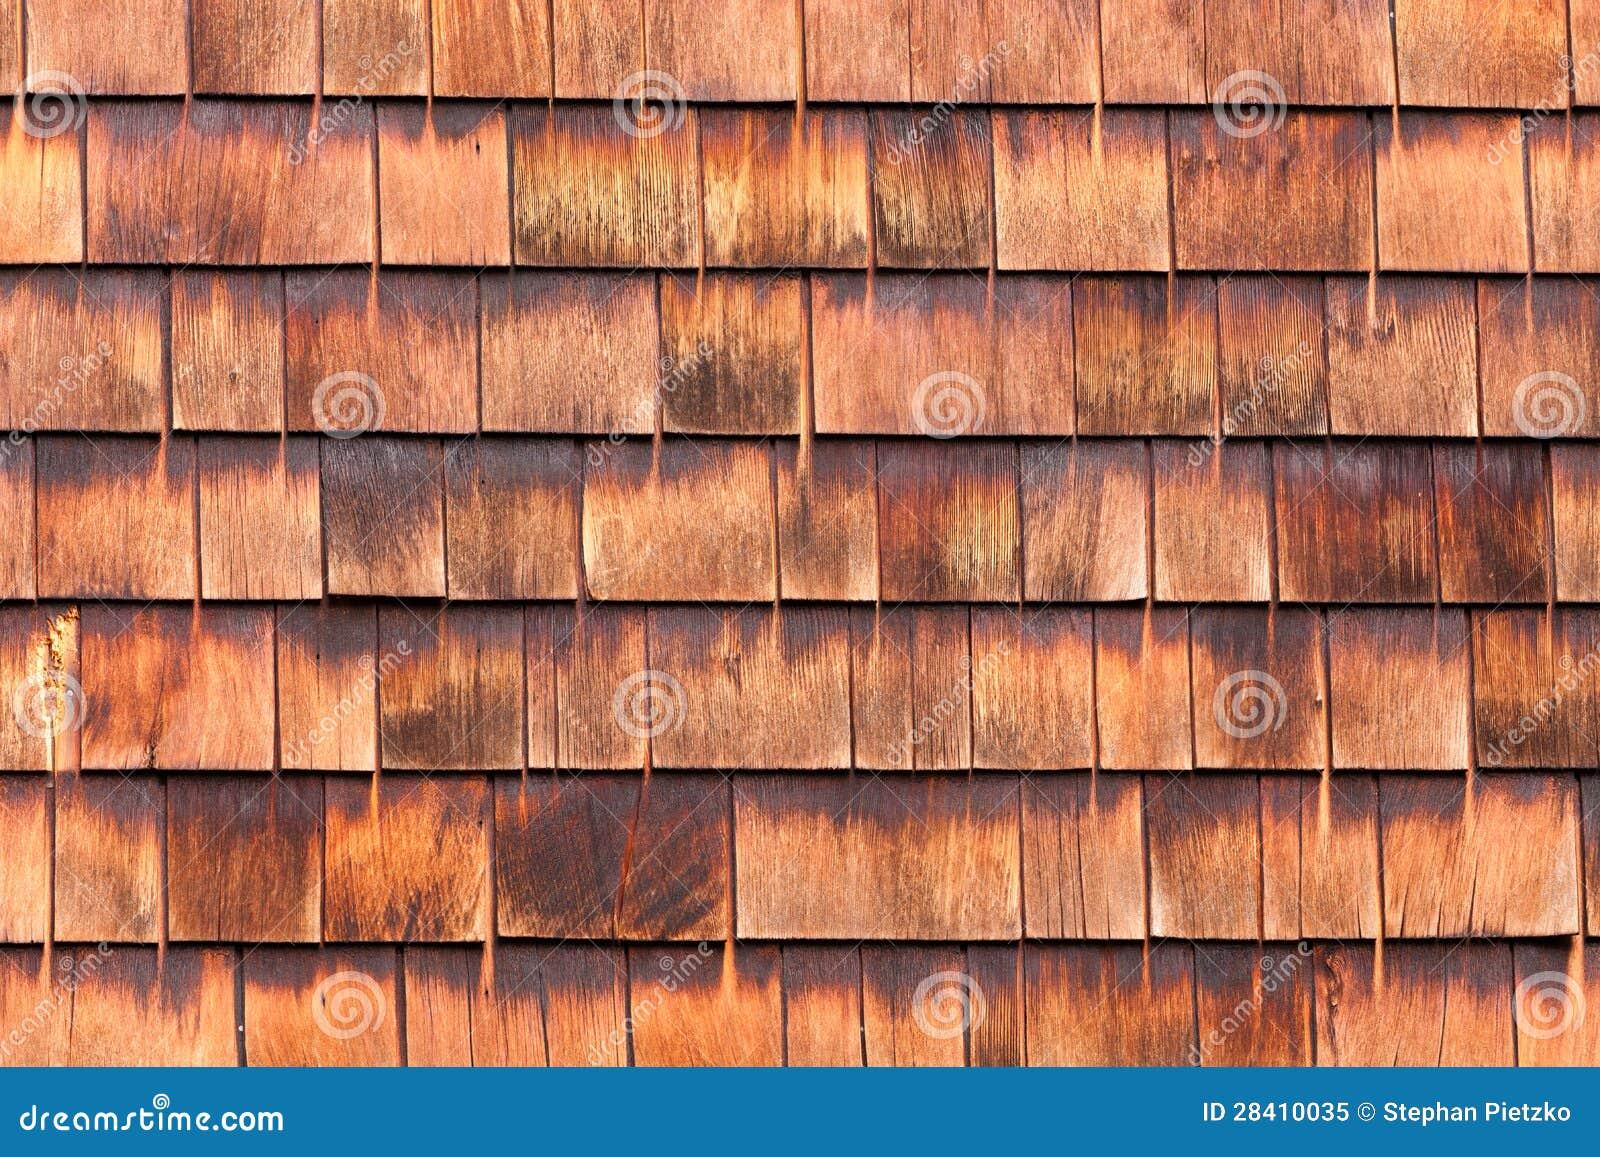 Westen red cedar shingles natural texture pattern stock for Cedar shingle prices